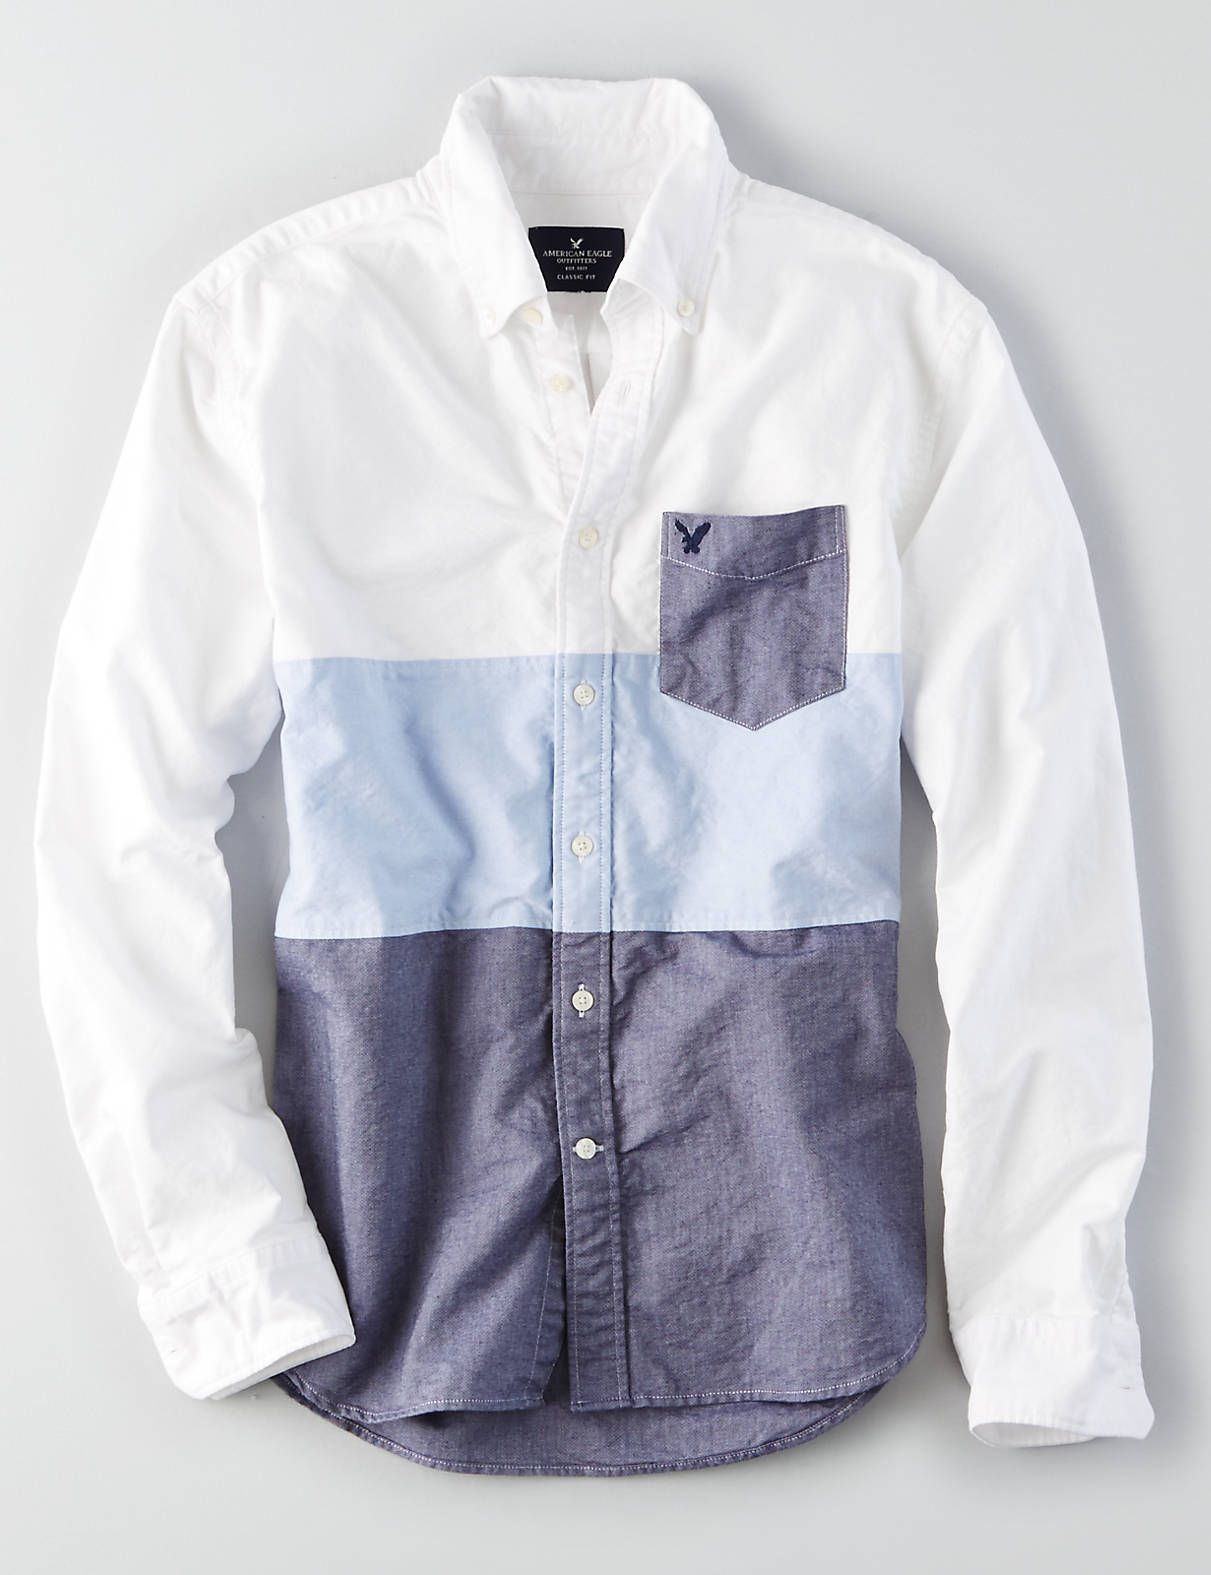 AEO Colorblock Short Sleeve Oxford Shirt | American eagle ...